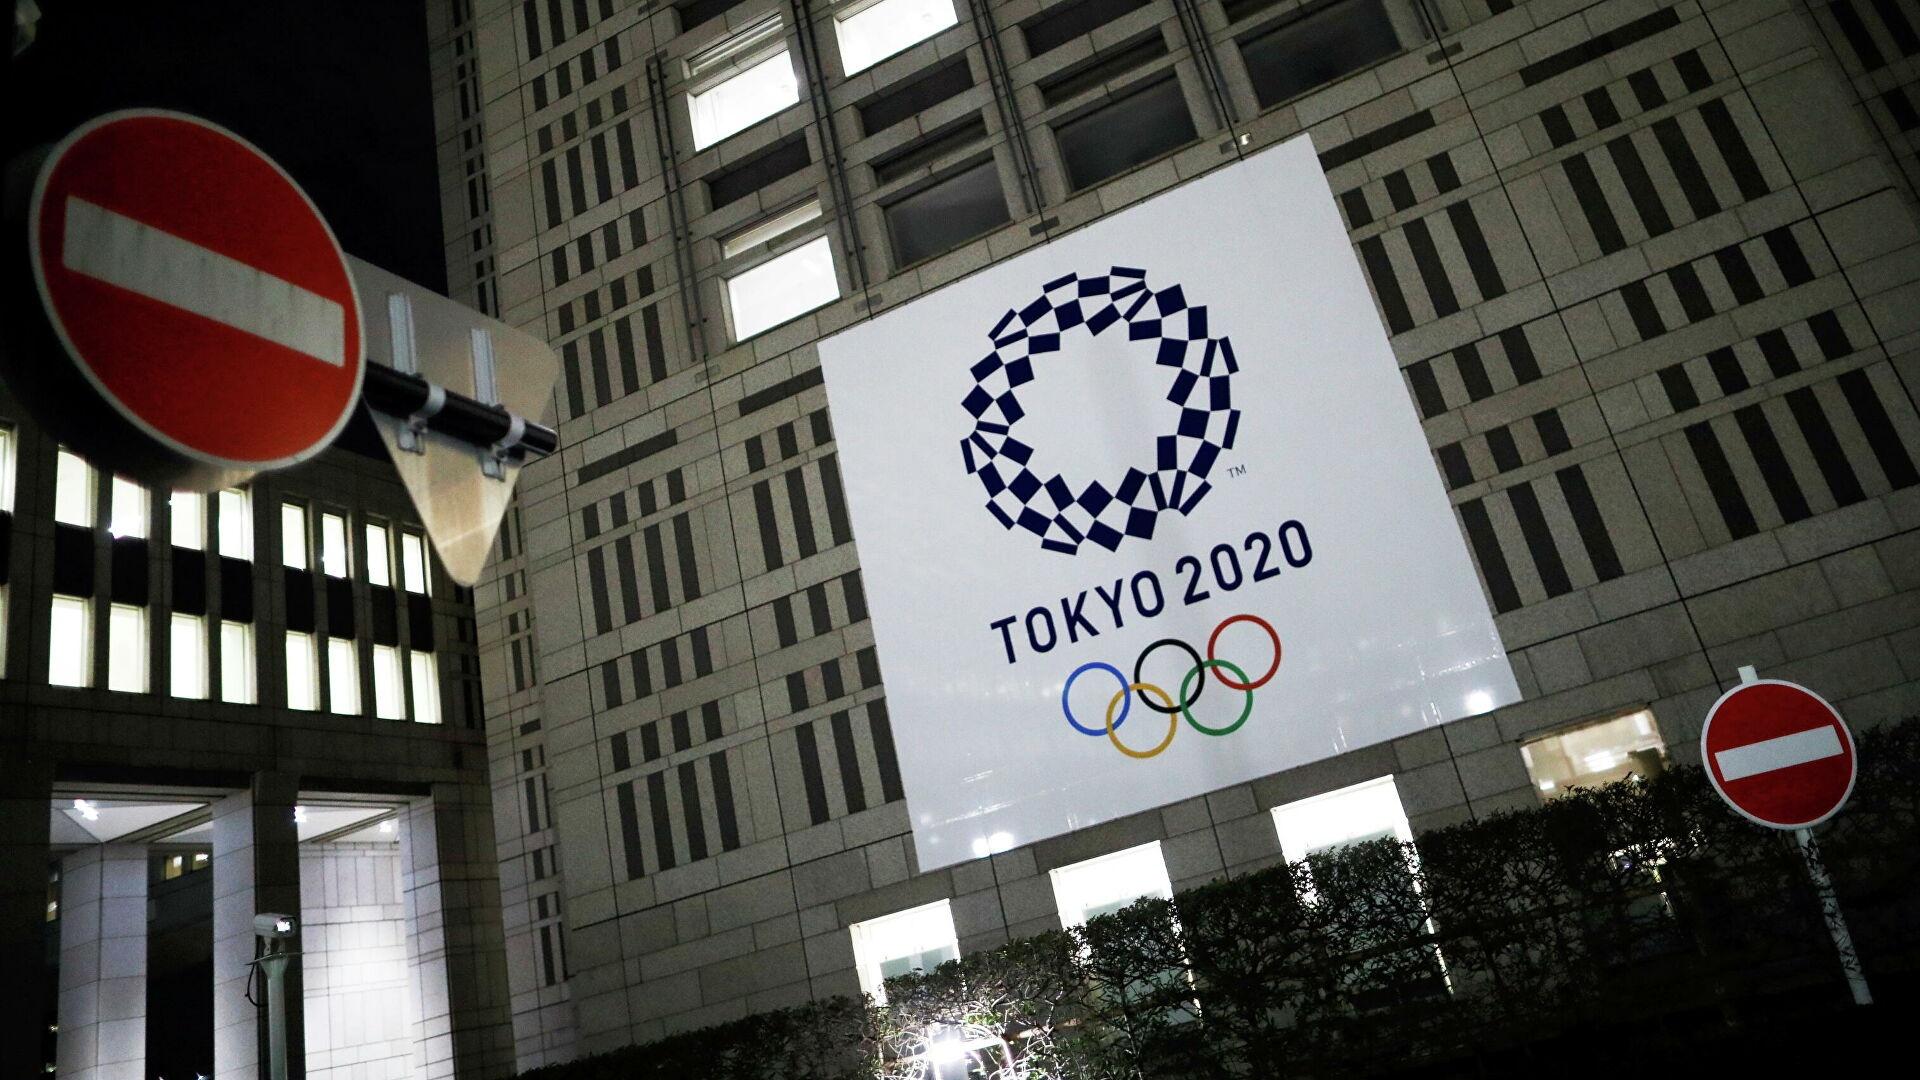 Tokyo 2020 Olympics free image